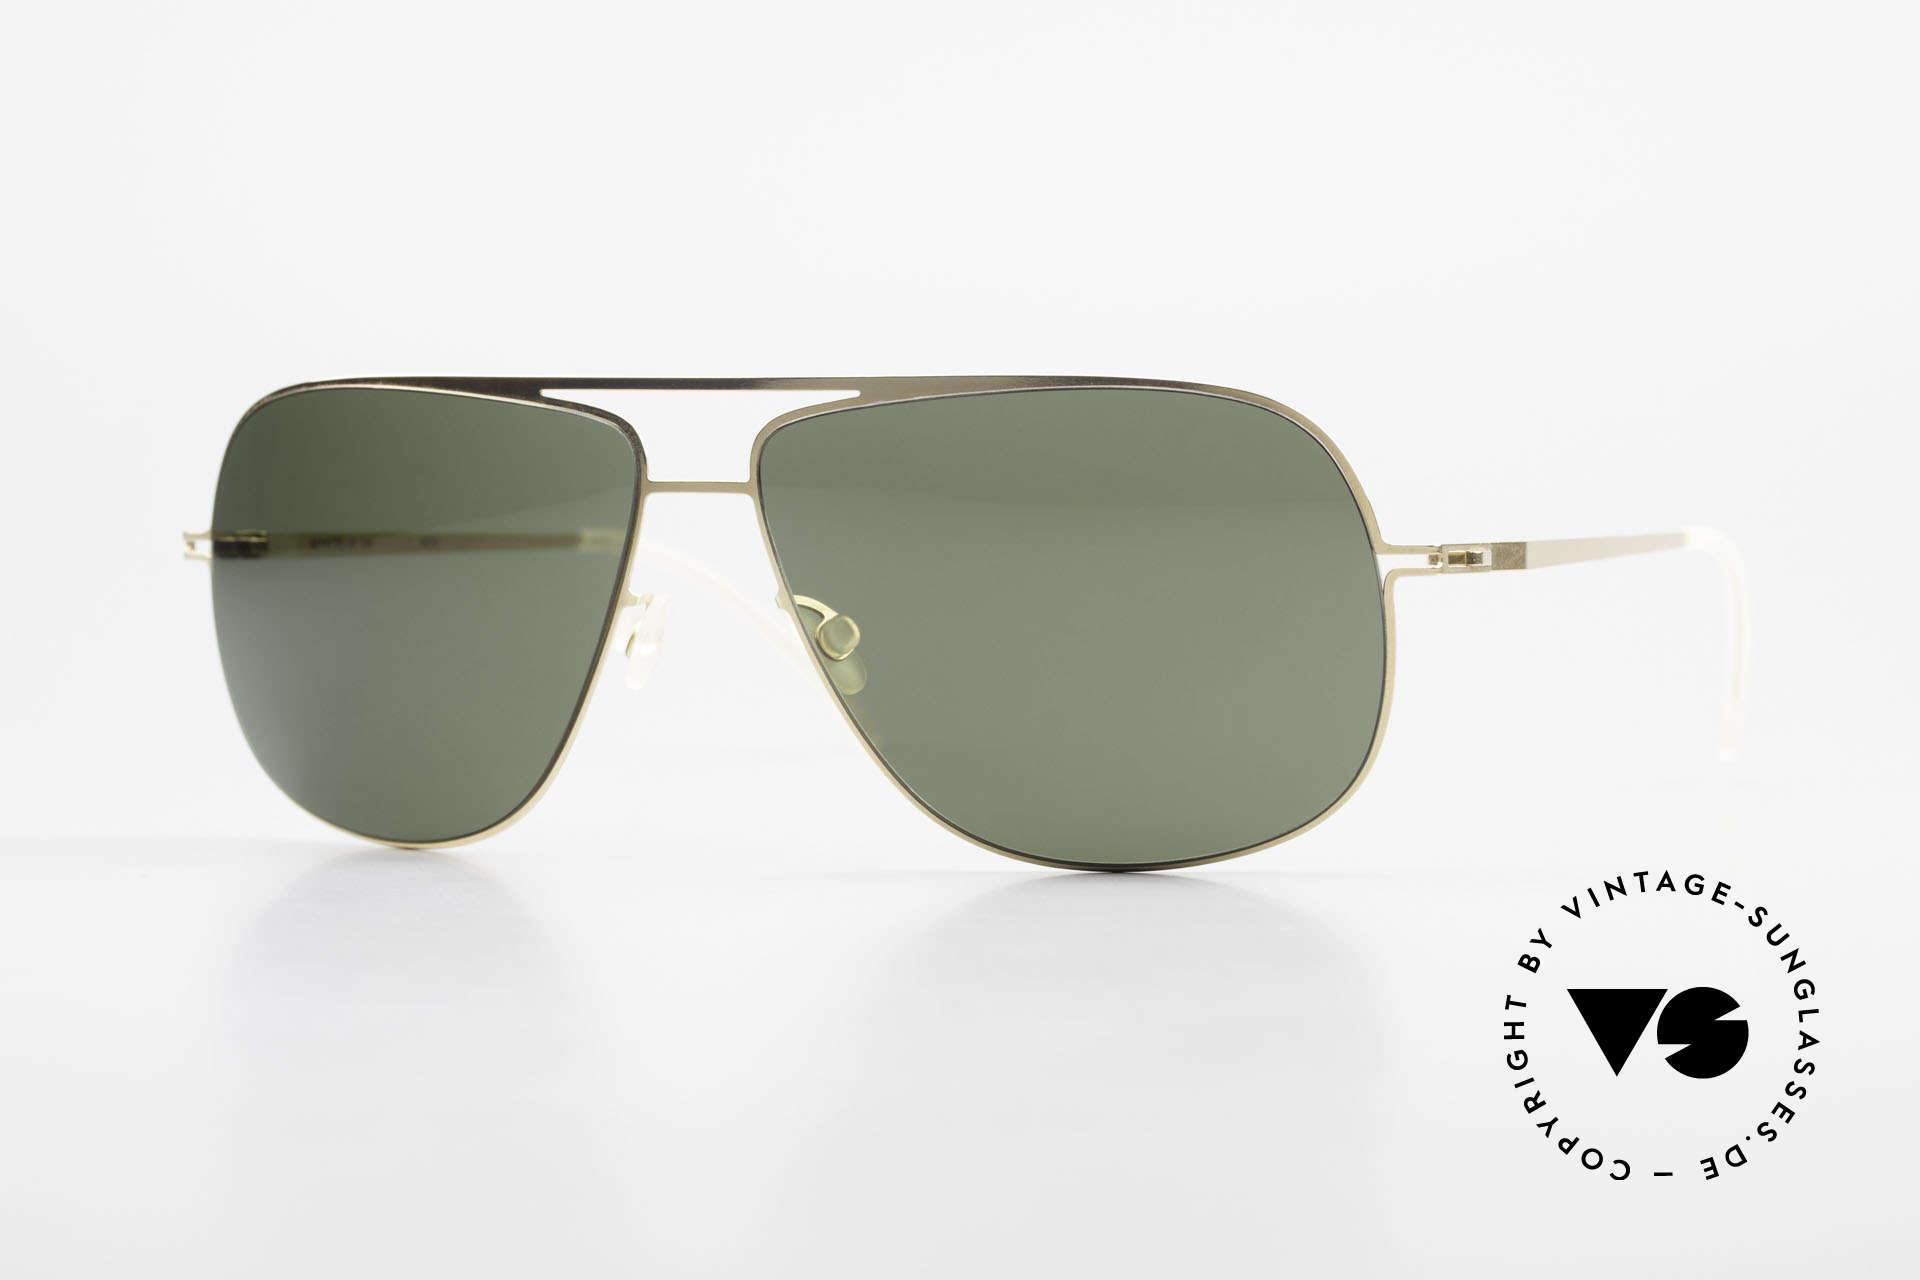 Mykita Jon Designer Lite Metal Sunglasses, VINTAGE unisex Mykita designer sunglasses from 2010, Made for Men and Women